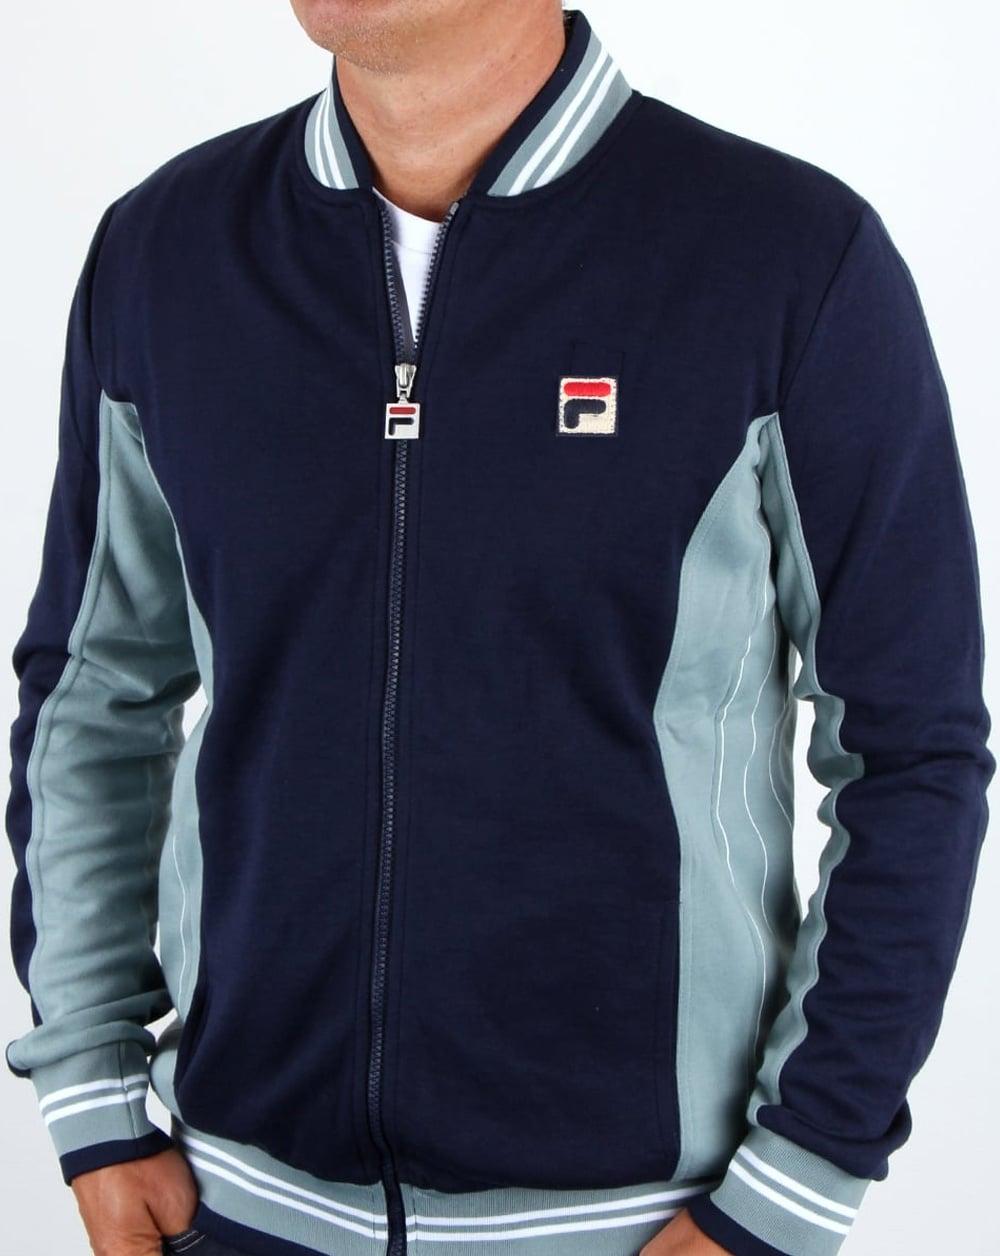 7167e8fbe0b4 Fila Vintage Settanta Track Top Navy/Steel Blue,mk1,jacket,borg,bj ...